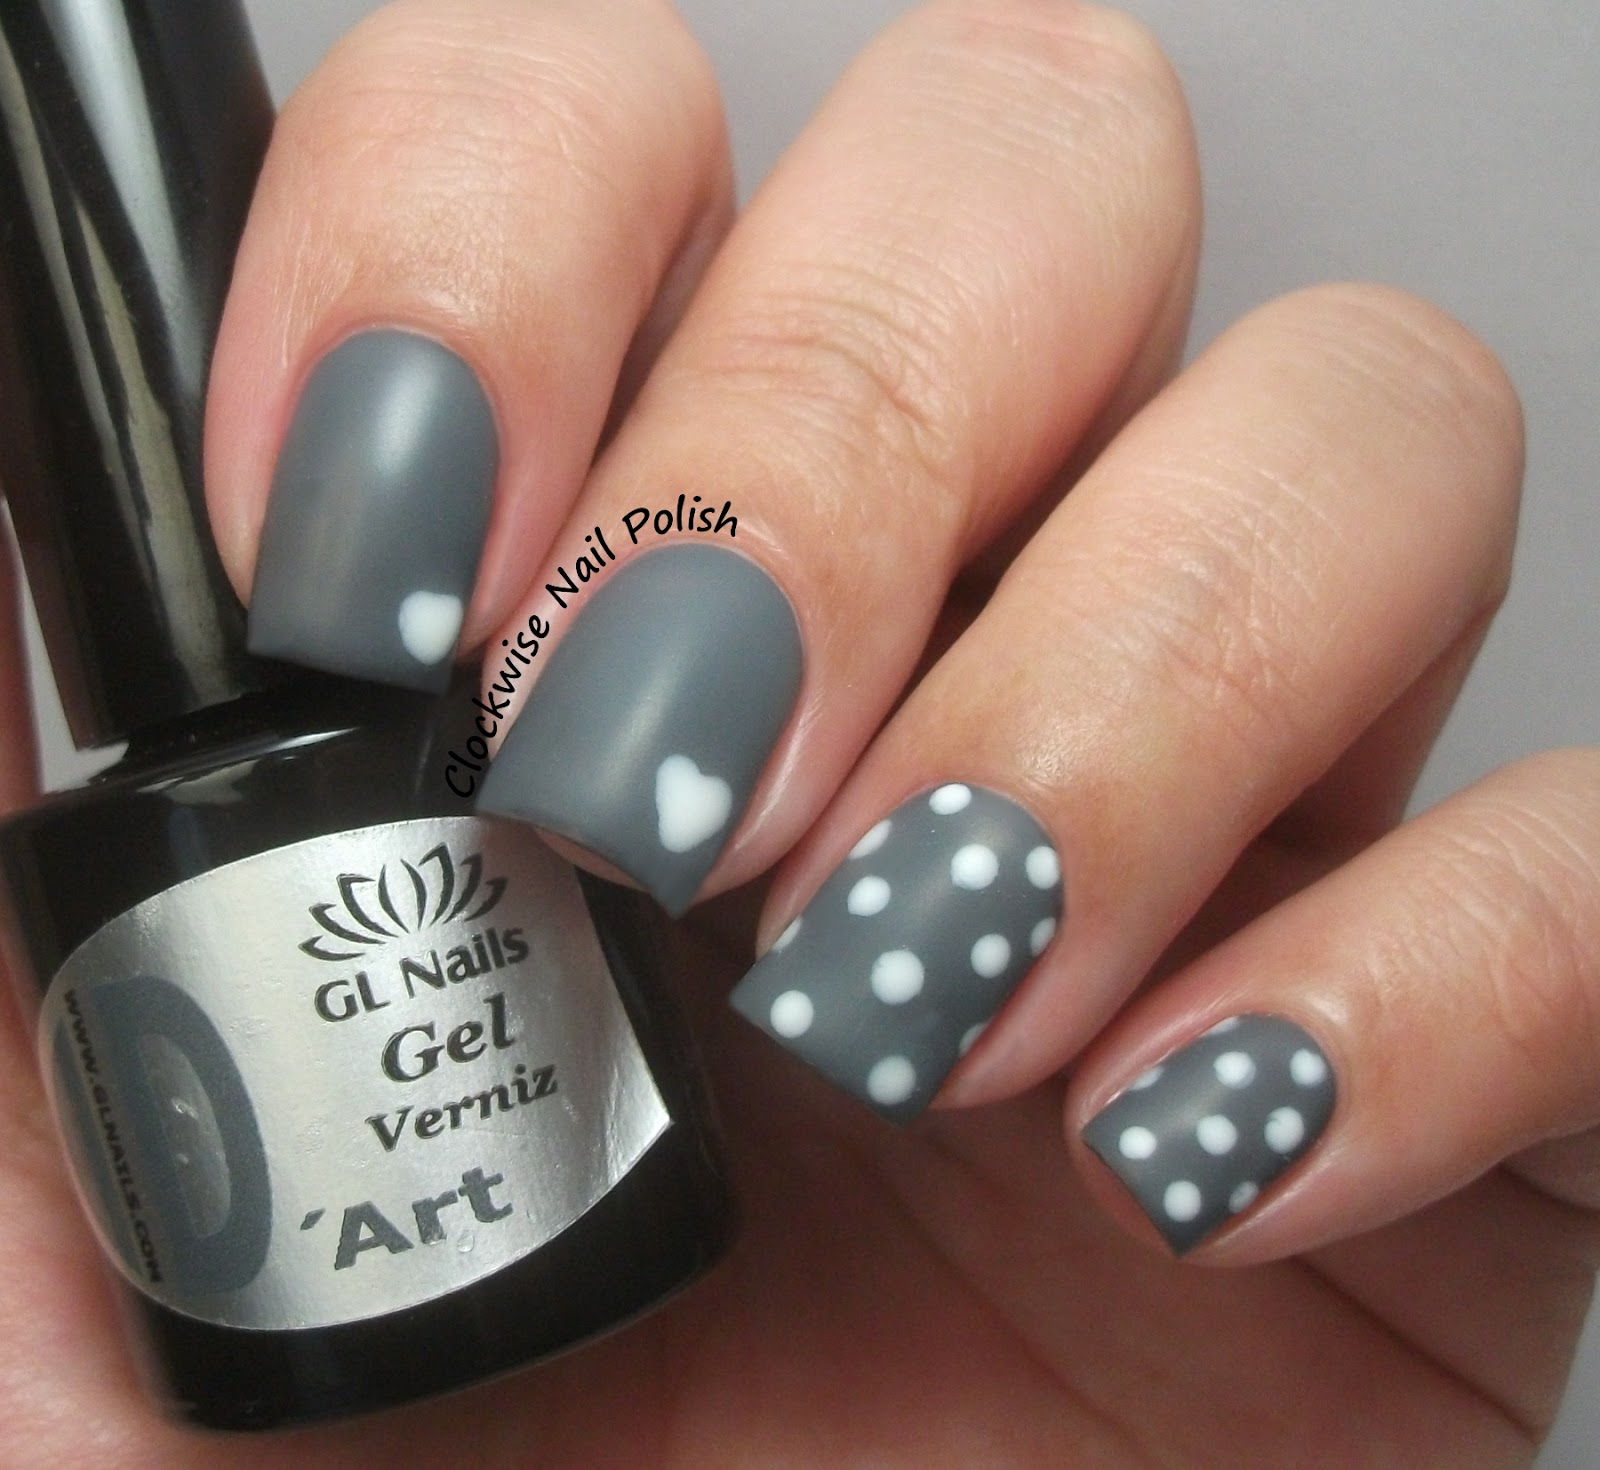 The Clockwise Nail Polish: GL Nails D\'Art Gel Polish Review